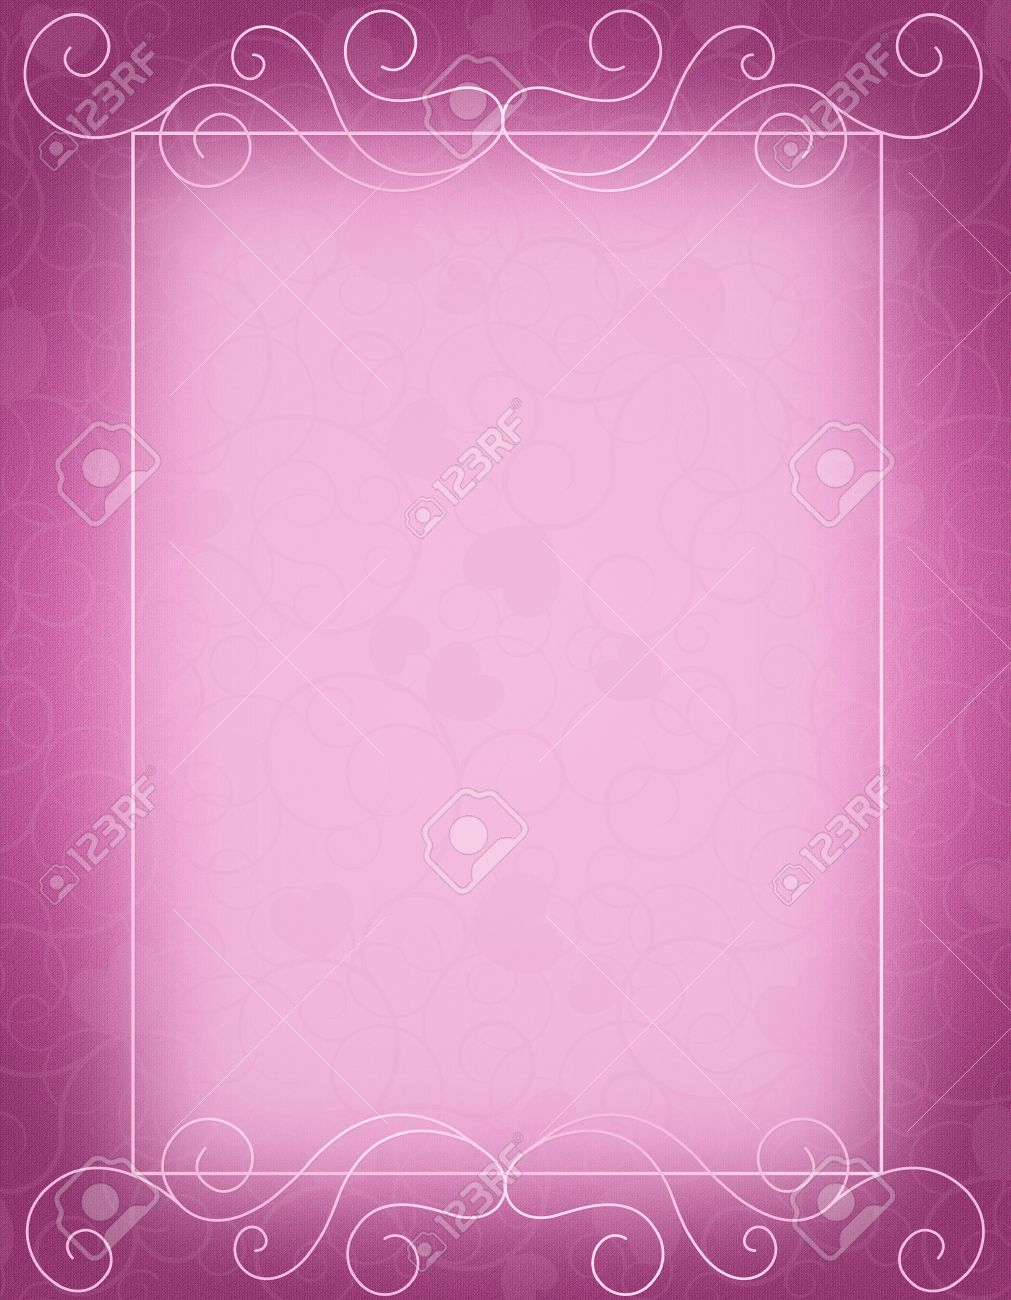 Púrpura Ornamental Frontera / Marco Especial Para El Fondo Tarjeta ...